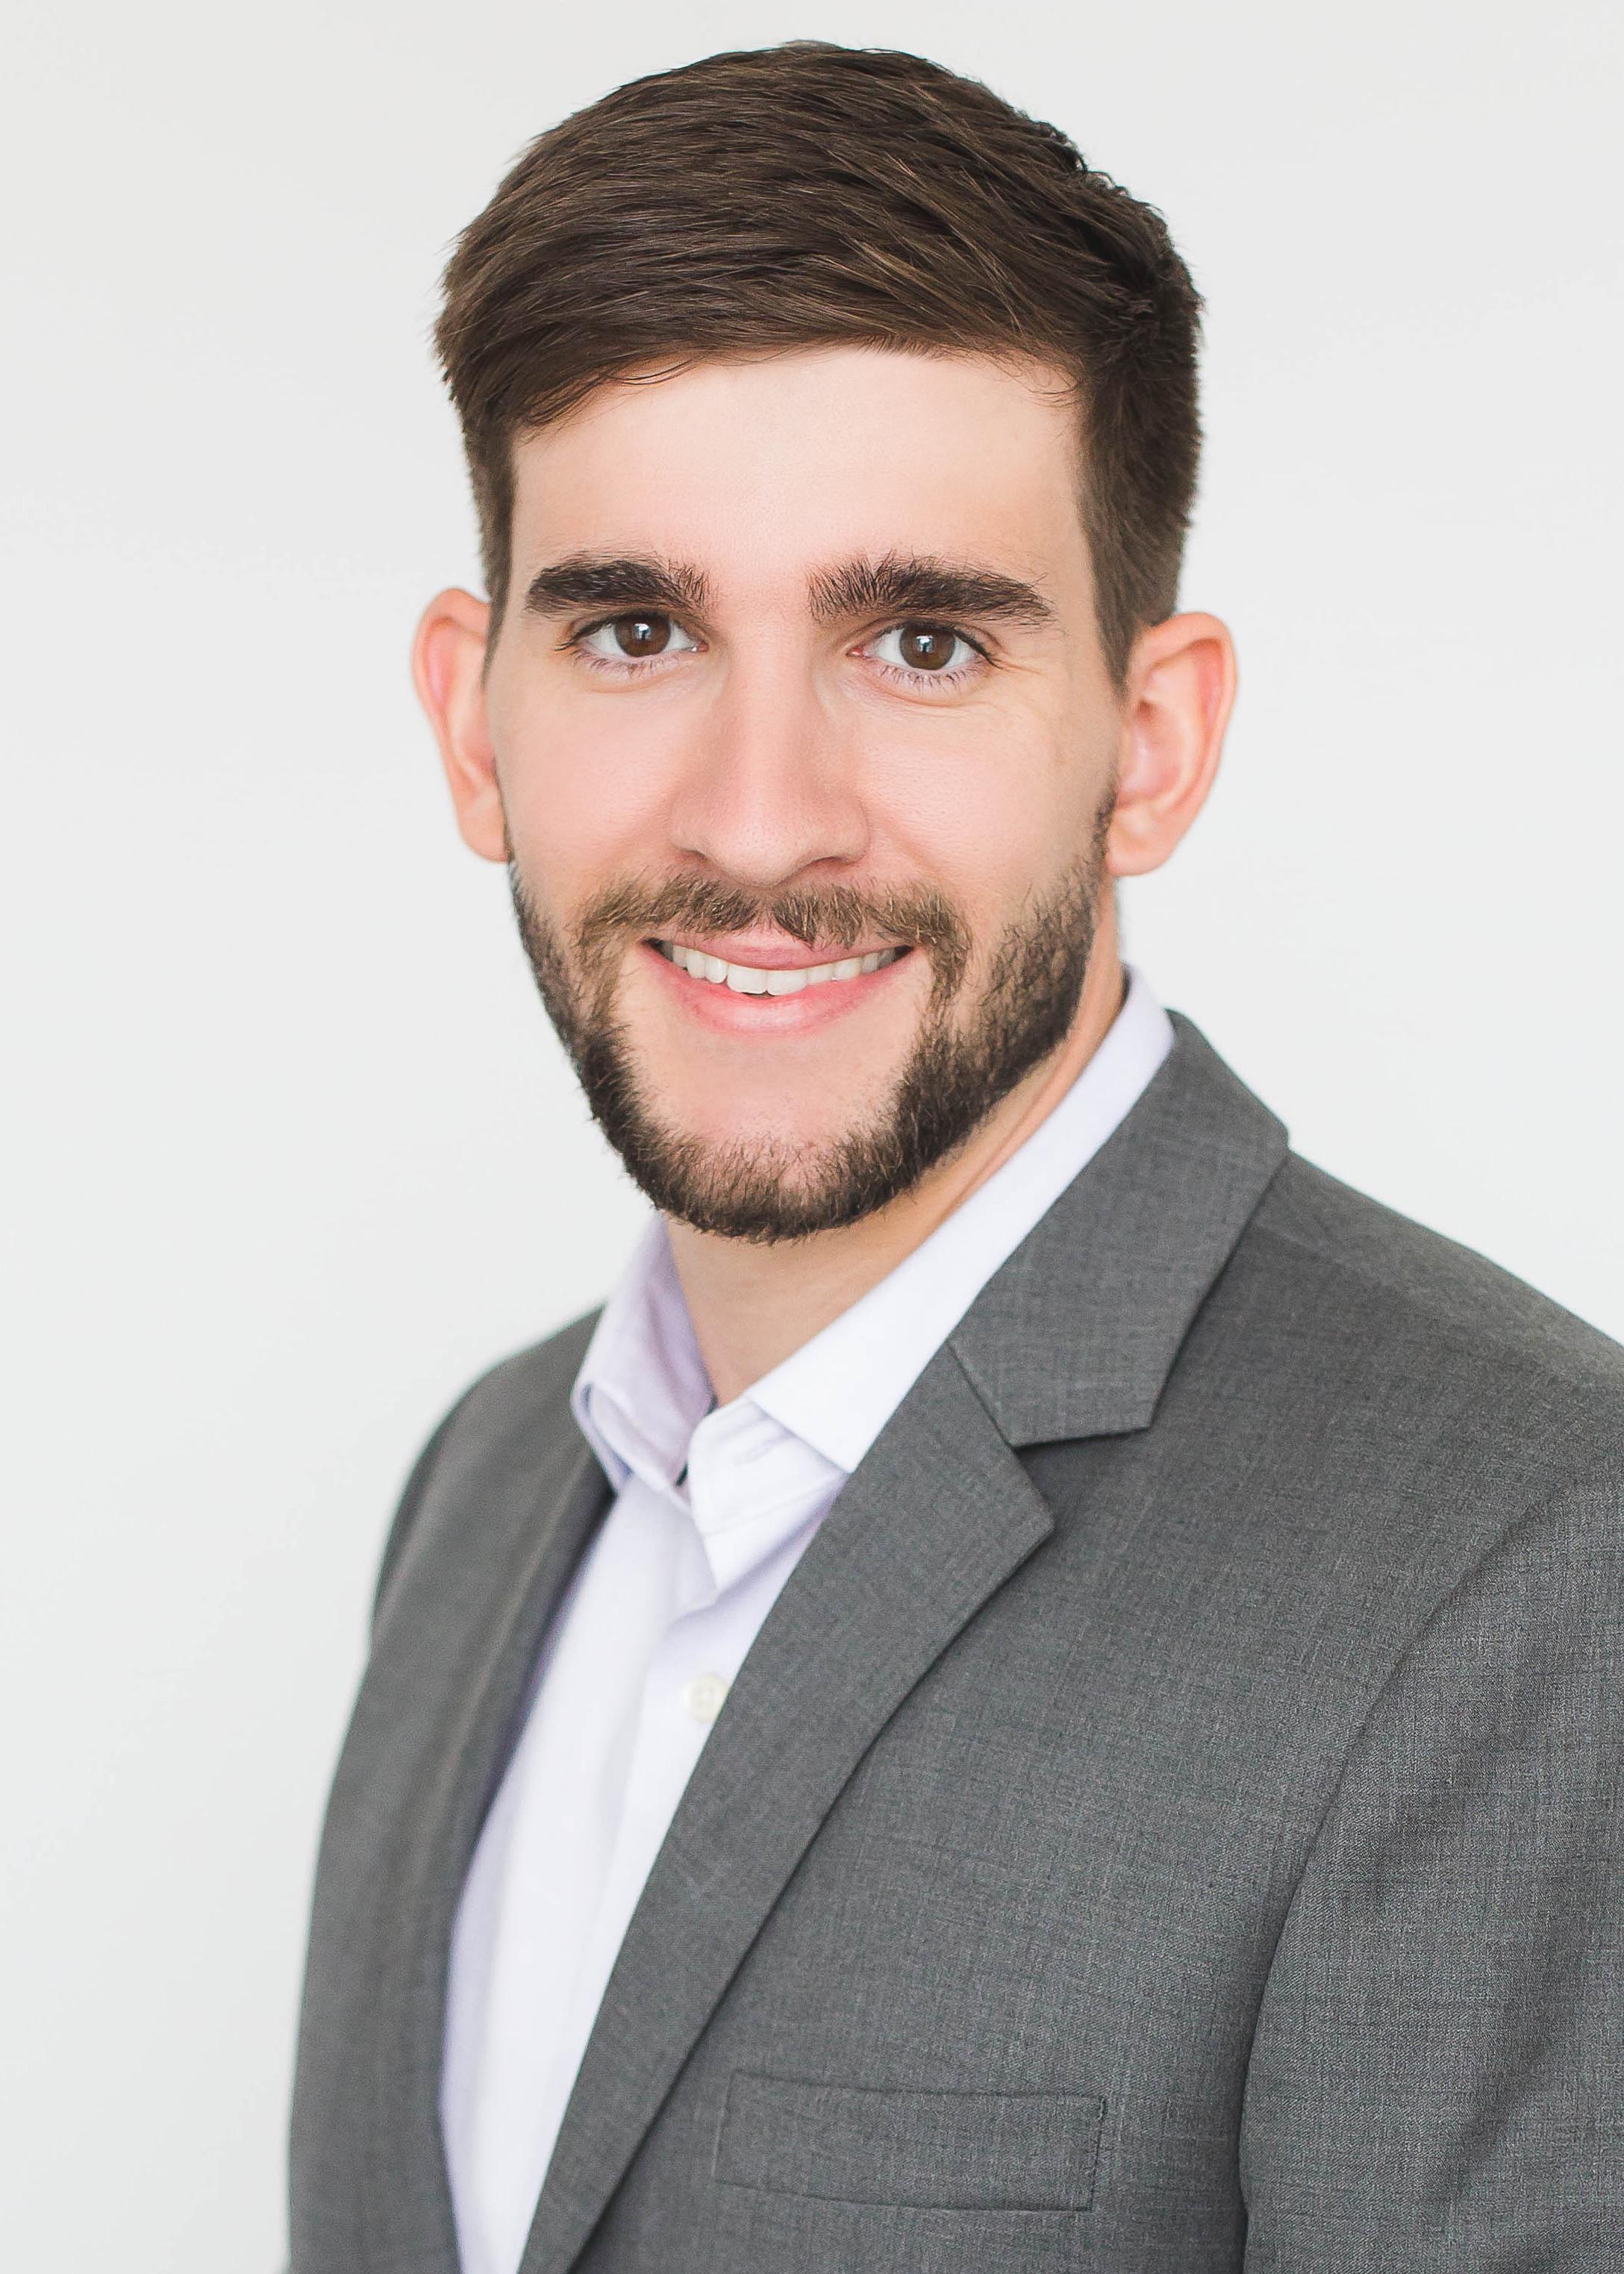 Ethan Reiner